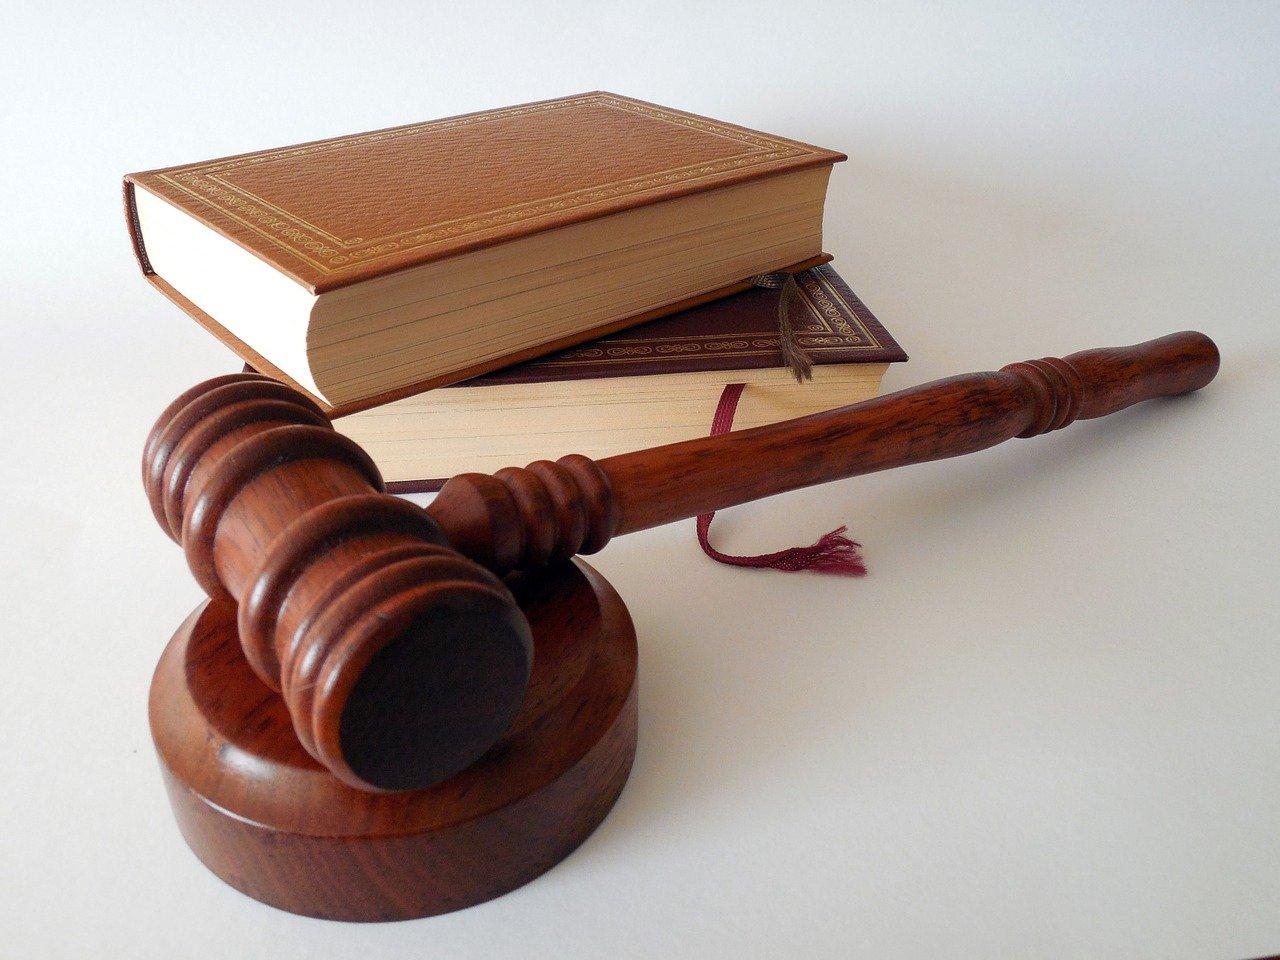 Cabinet d'avocats international